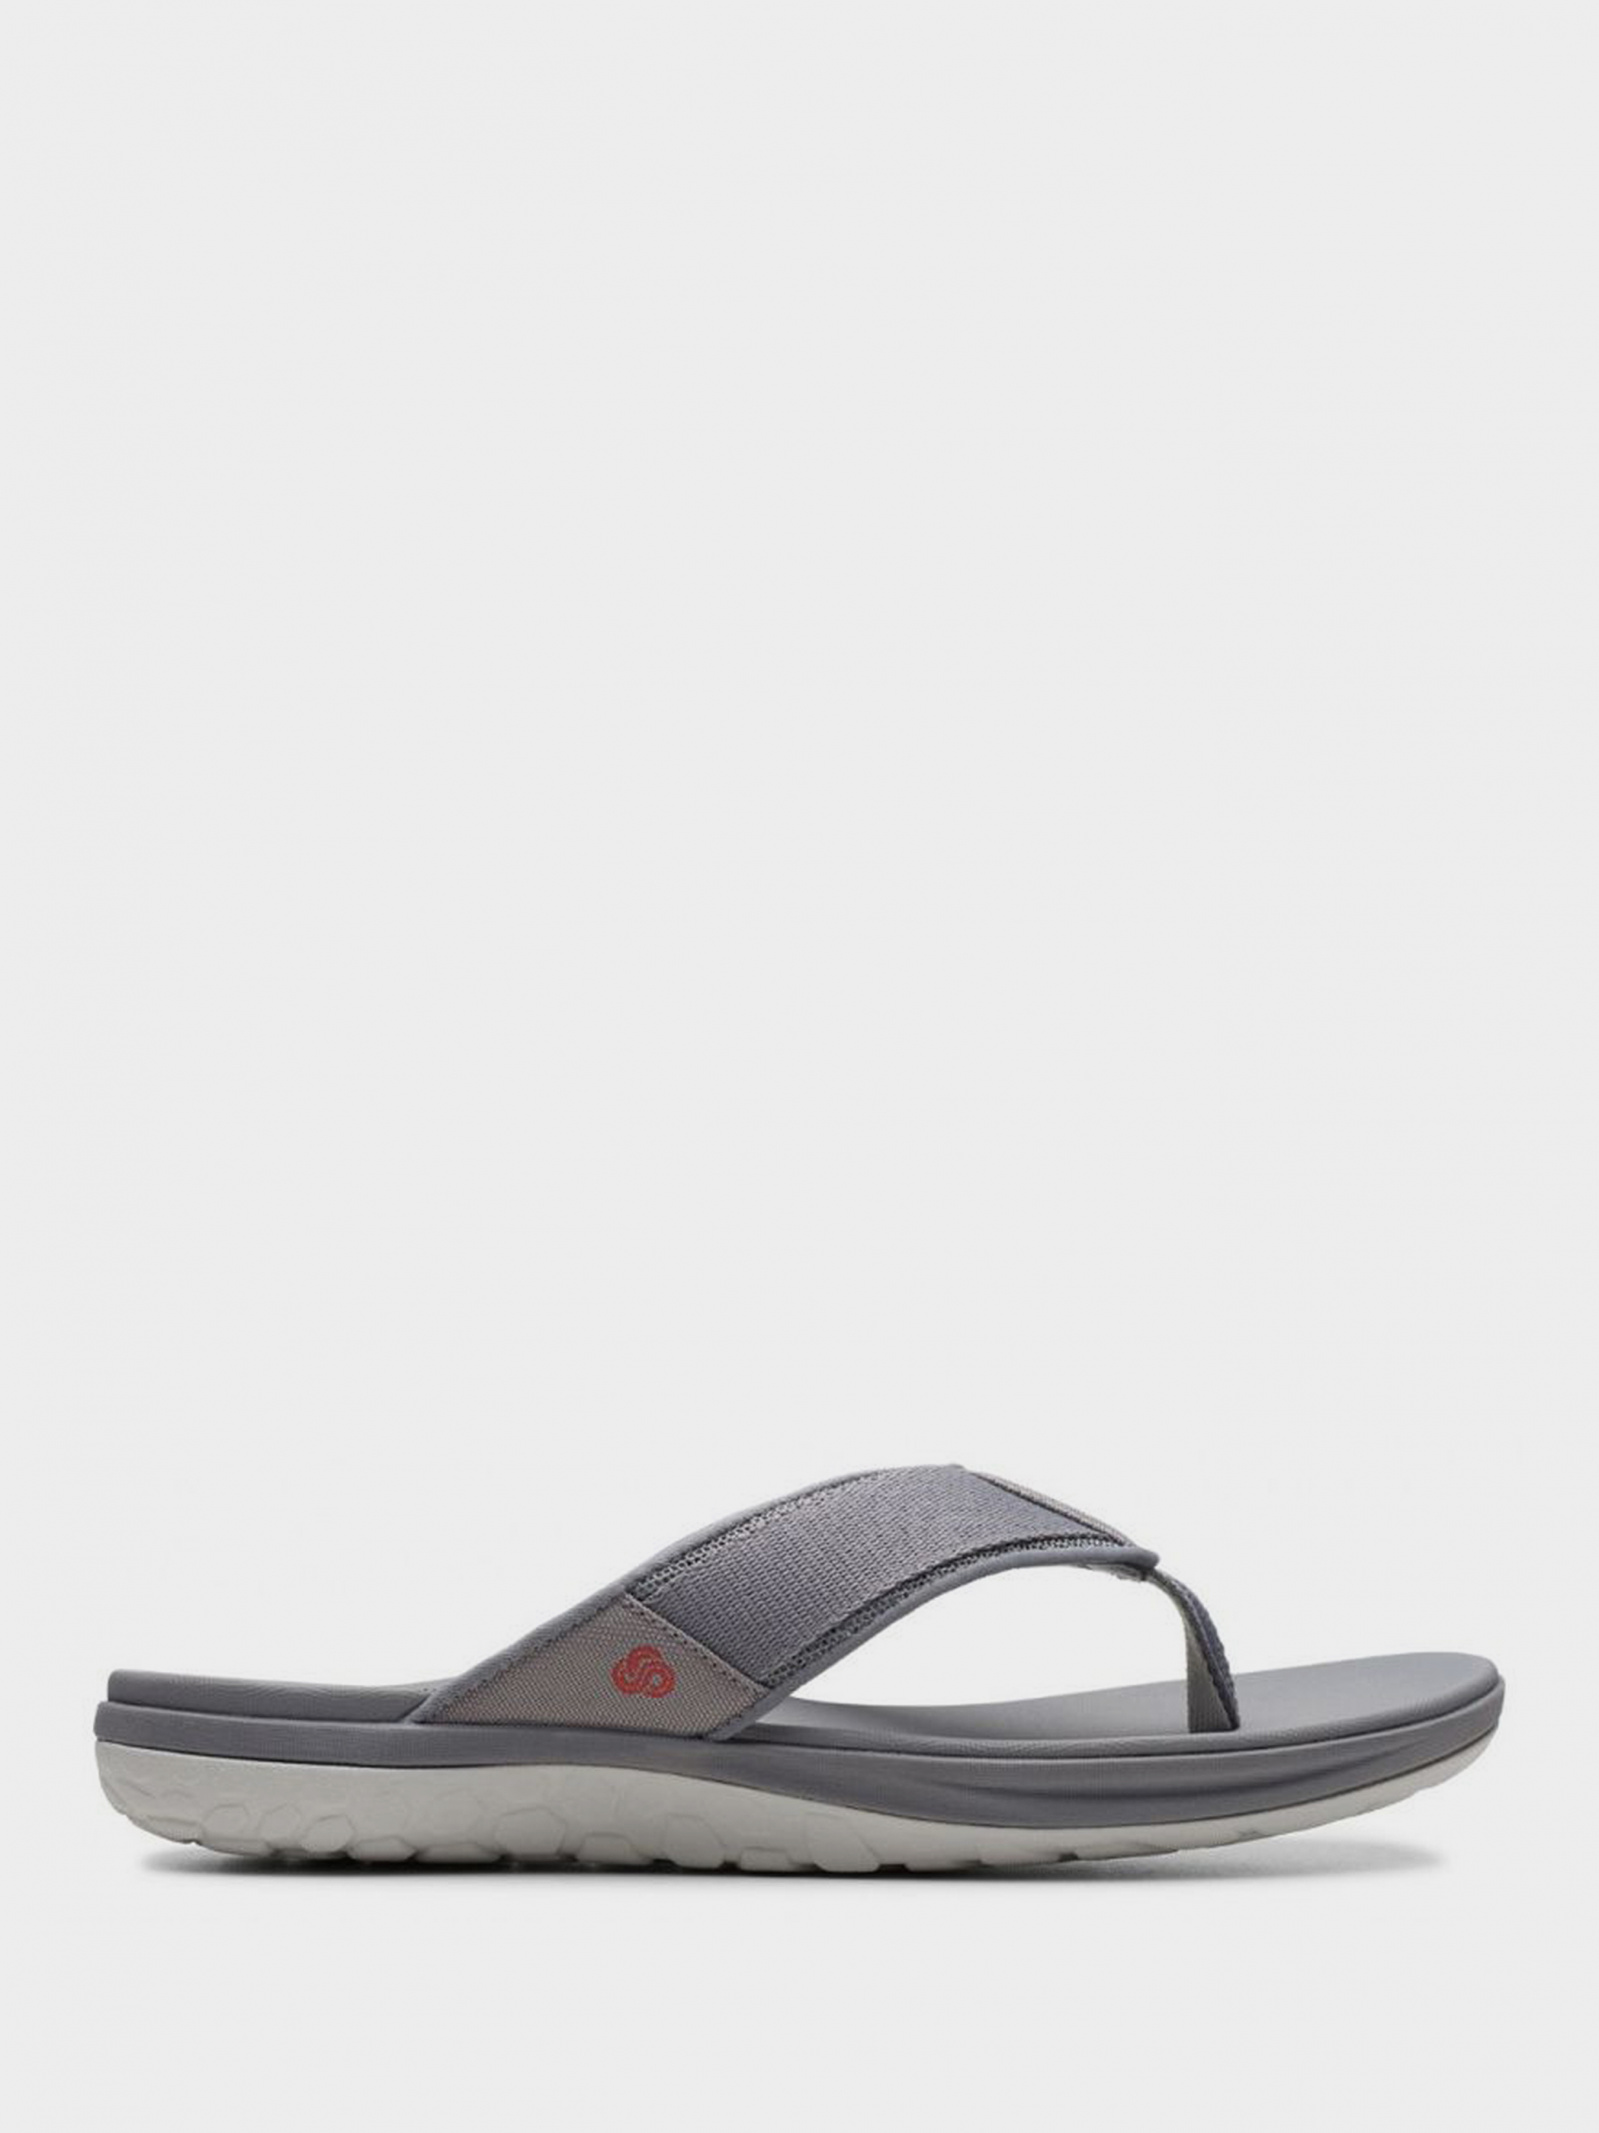 Каталог бренда Clarks  купить обувь bb145ae66b1d9